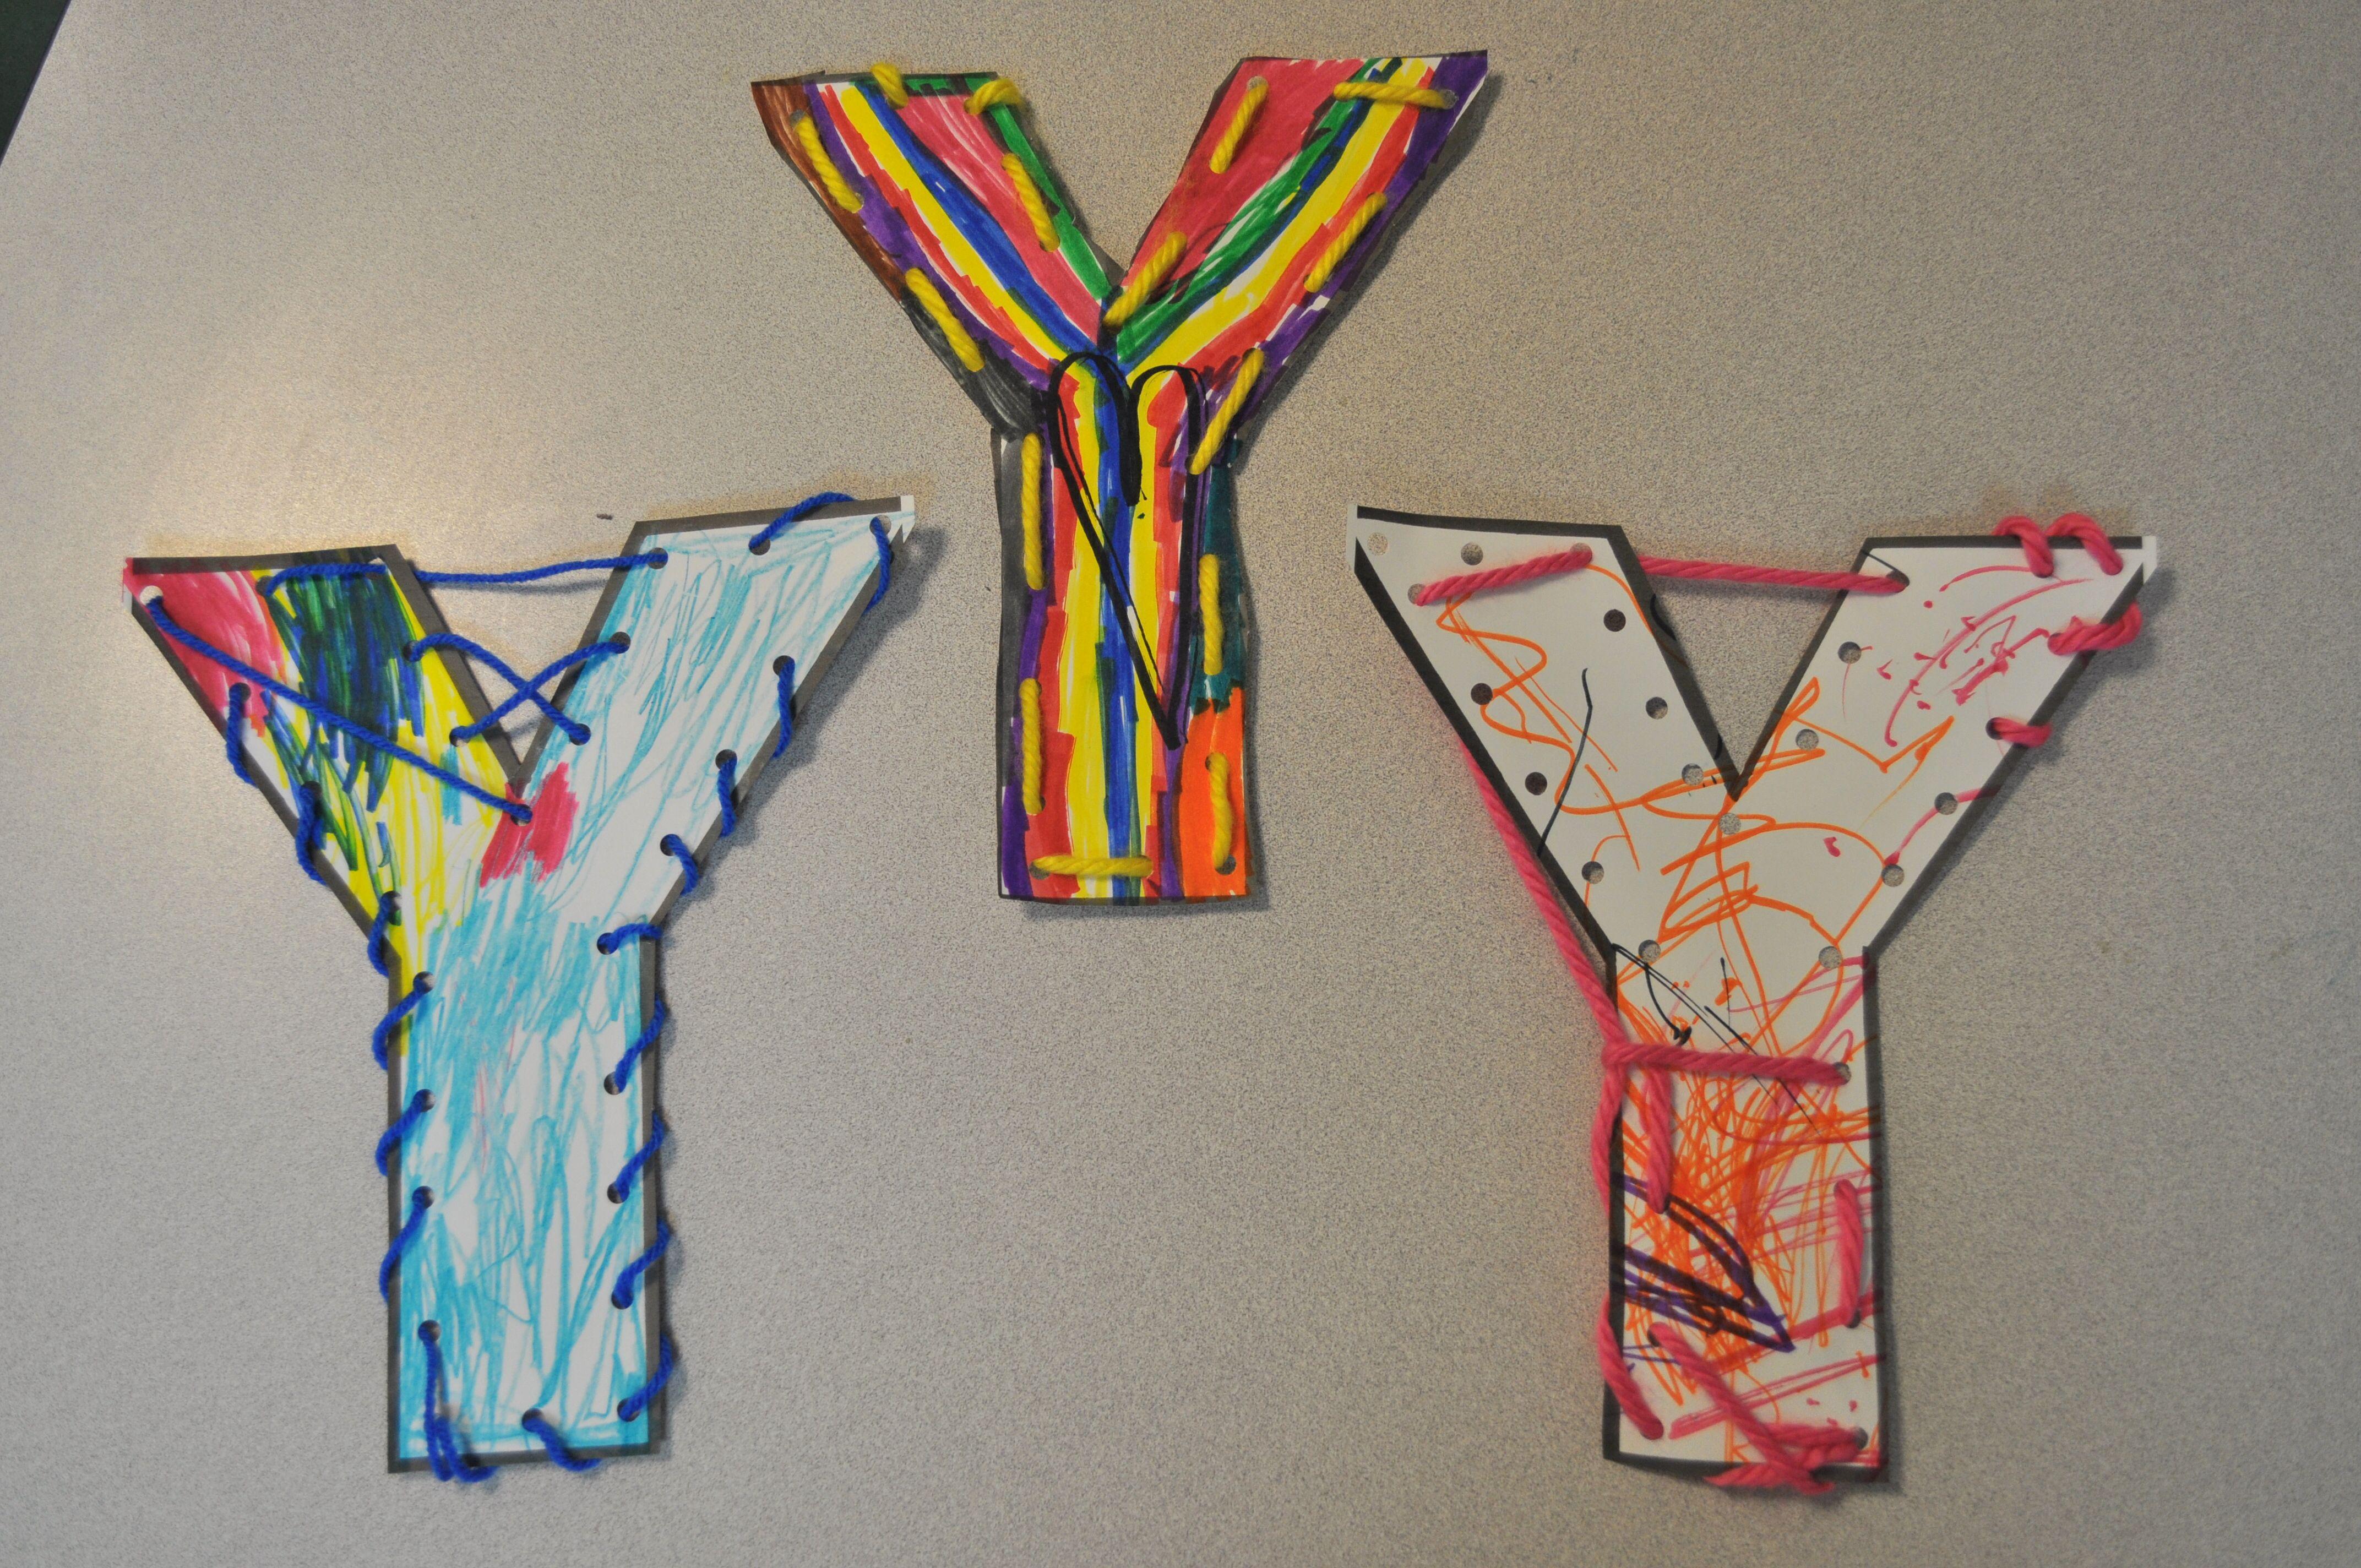 yarn activities for preschoolers y is for yarn preschool yarns 733